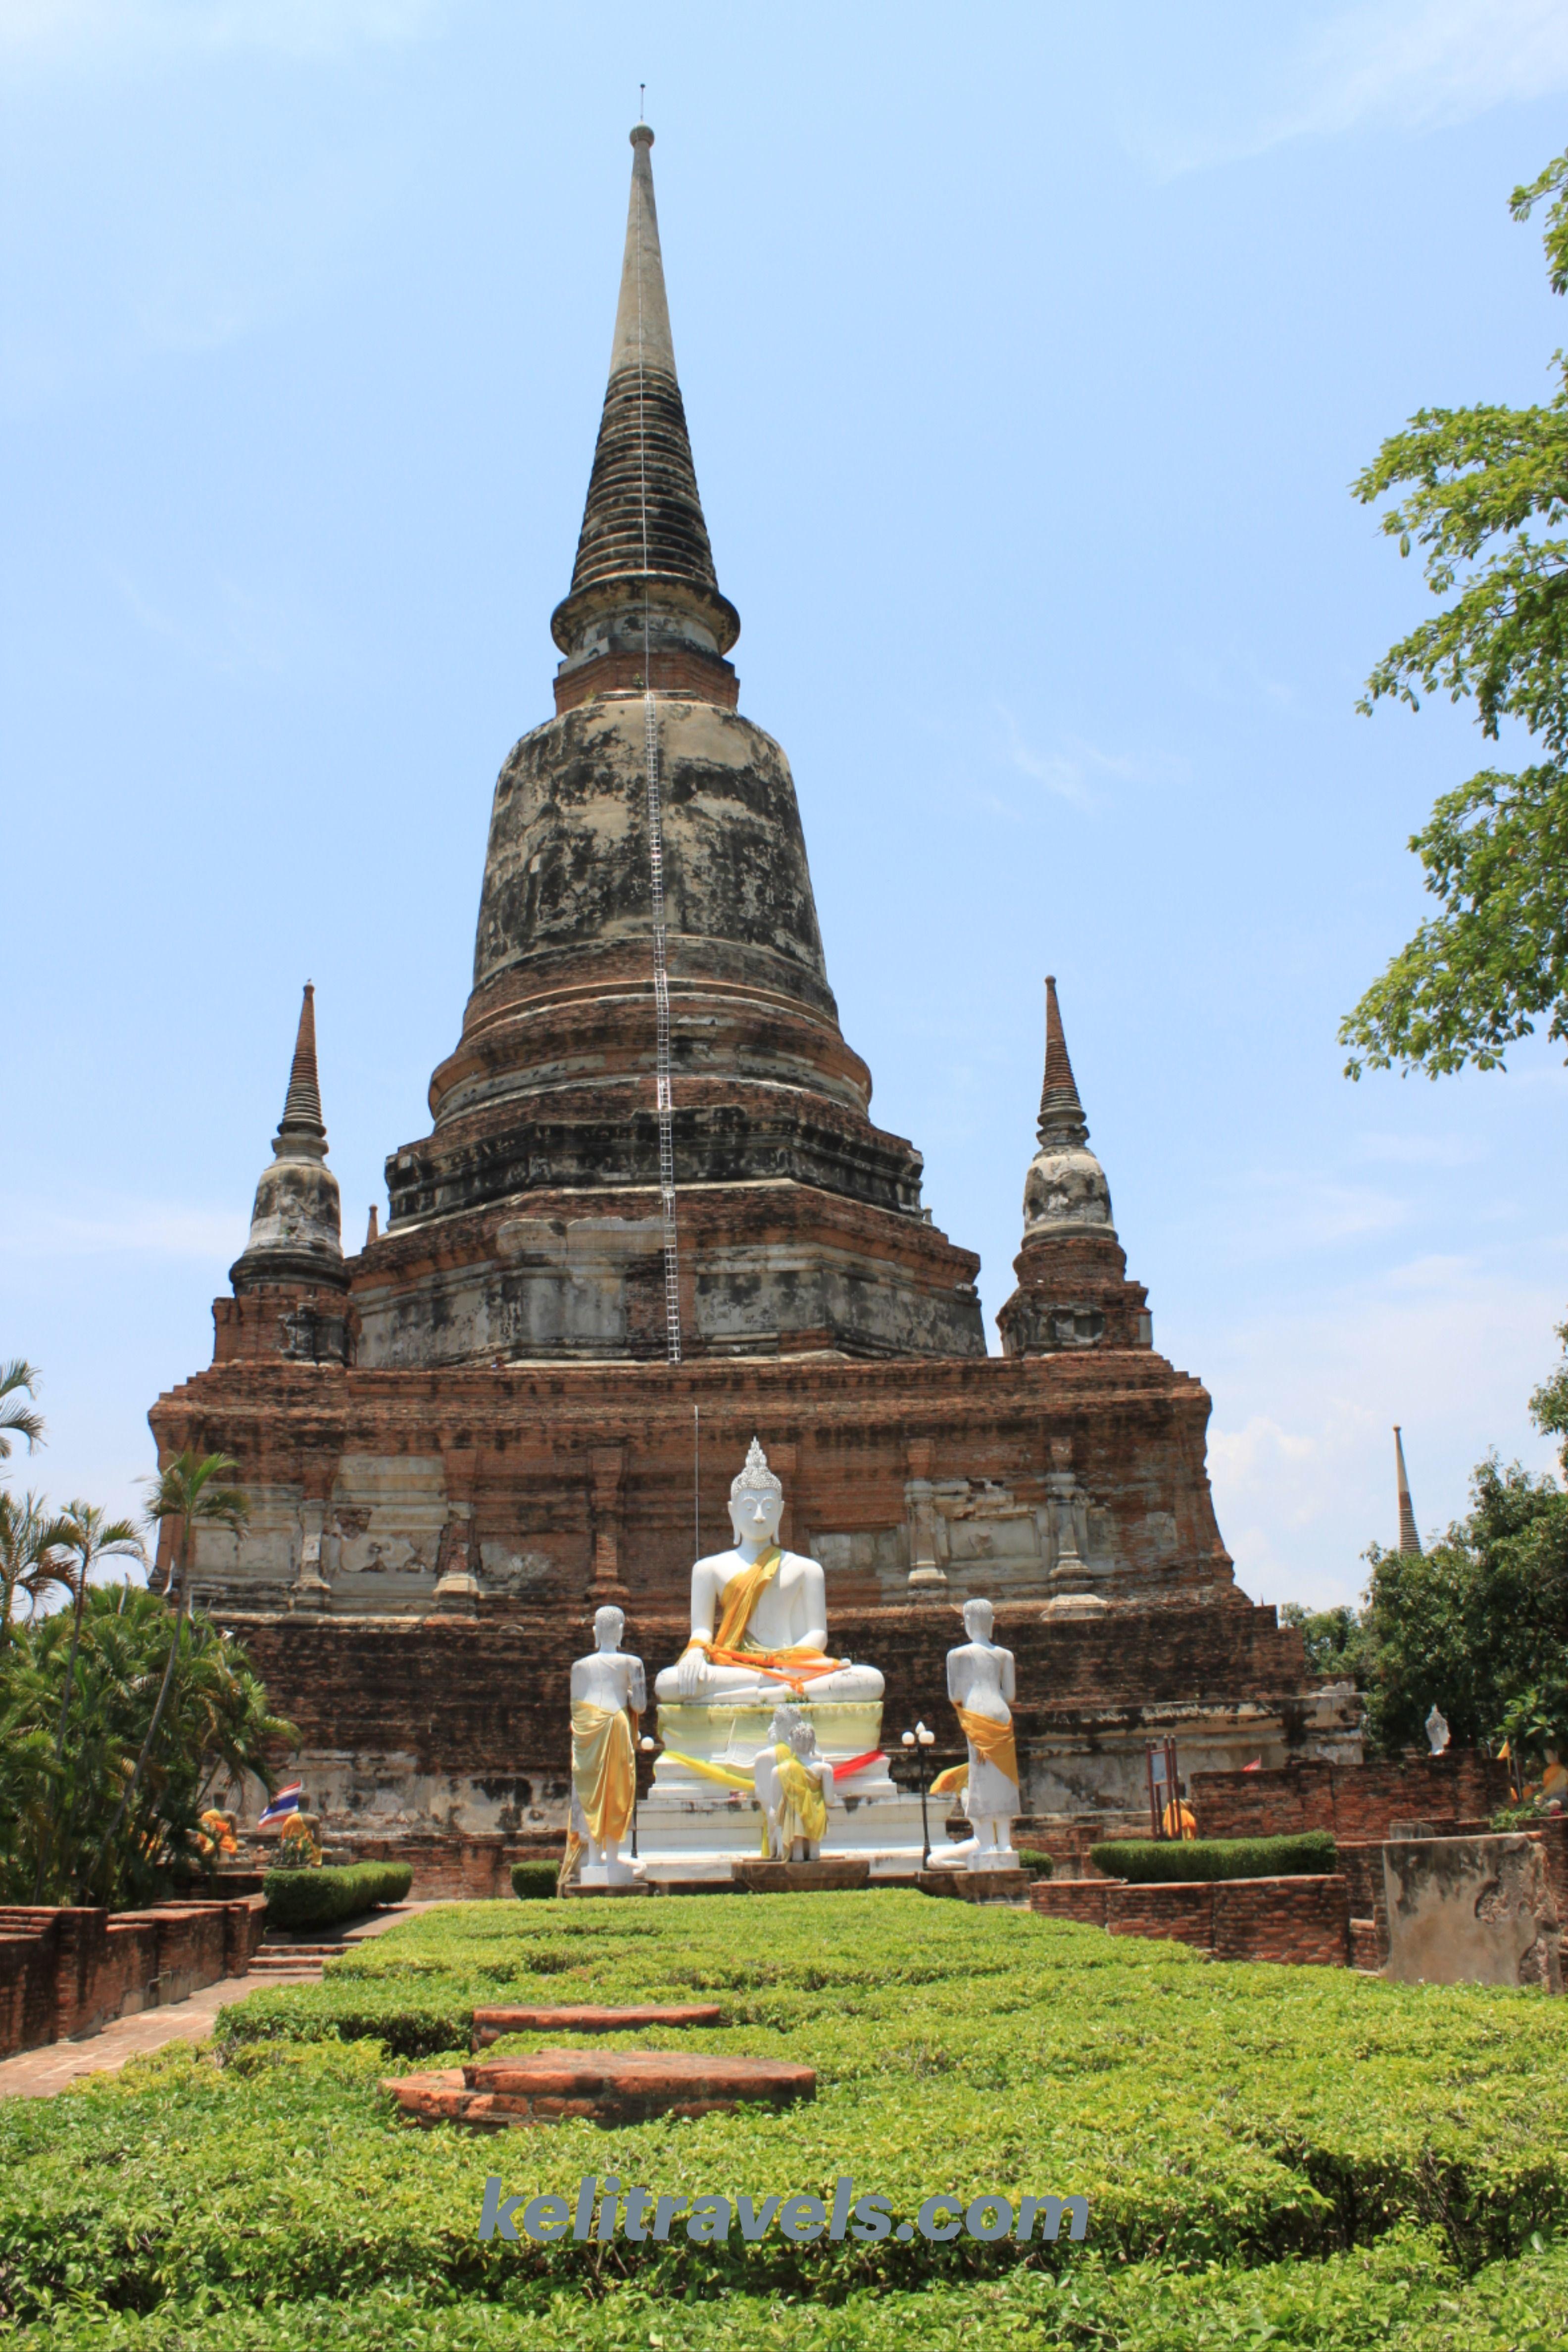 fd59d28c12cae382e3883e1d0d7250b4 - How Do I Get From Bangkok To Ayutthaya By Train